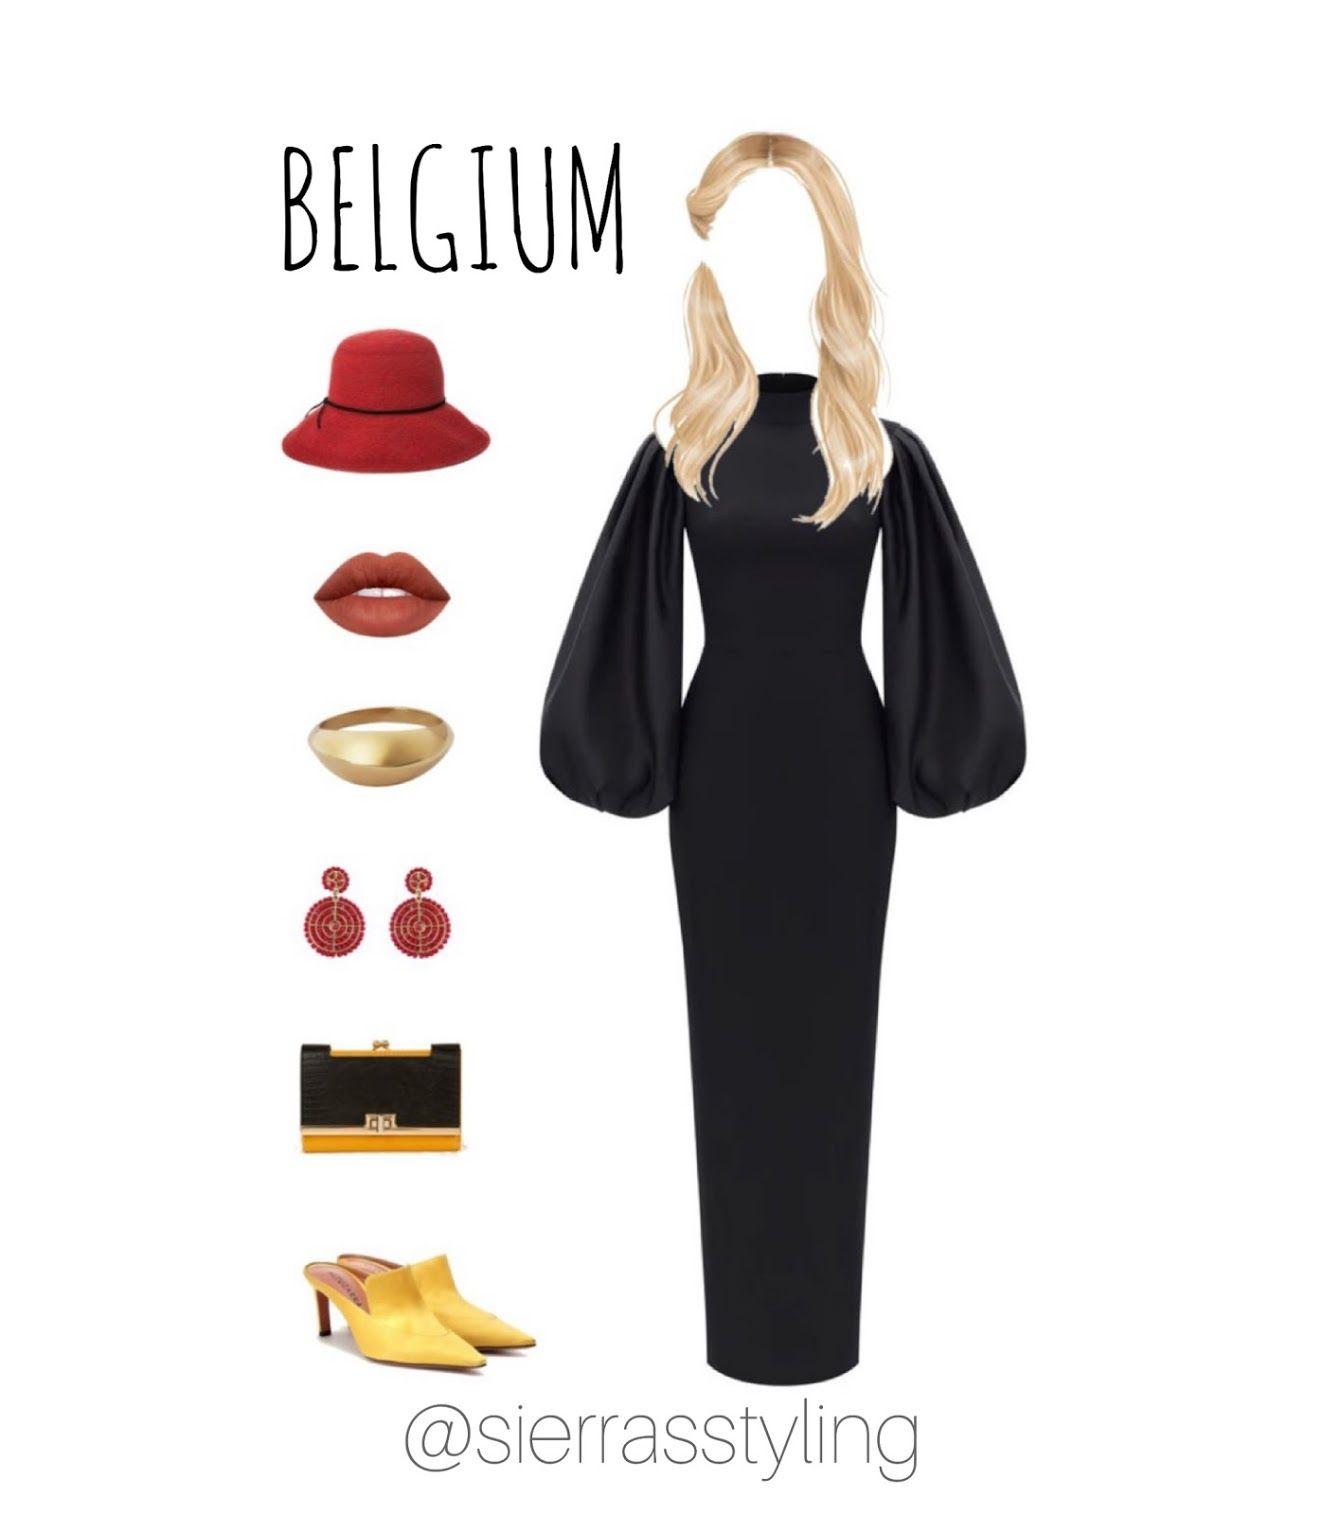 Belgium Dress With Accessories Virtual Fashion Online Stylist Virtual Stylist [ 1515 x 1323 Pixel ]